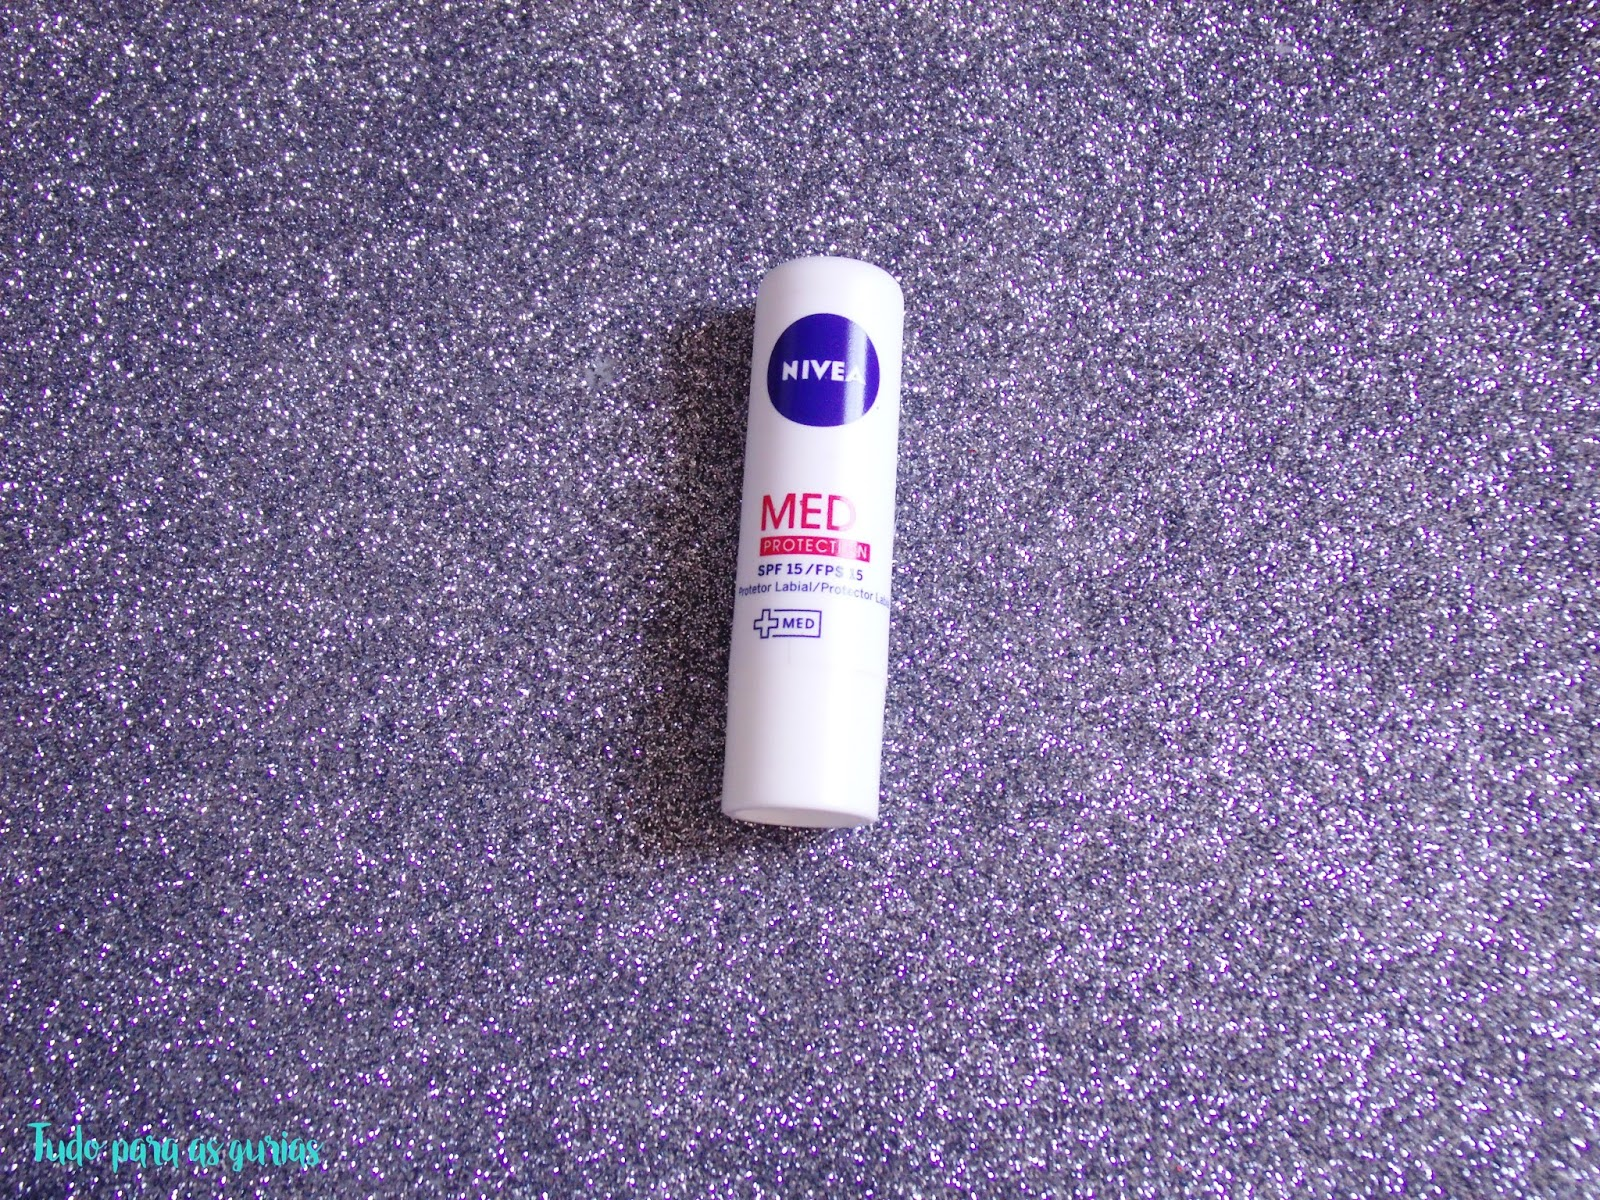 Testei e gostei Protetor labial MED Protection da Nivea